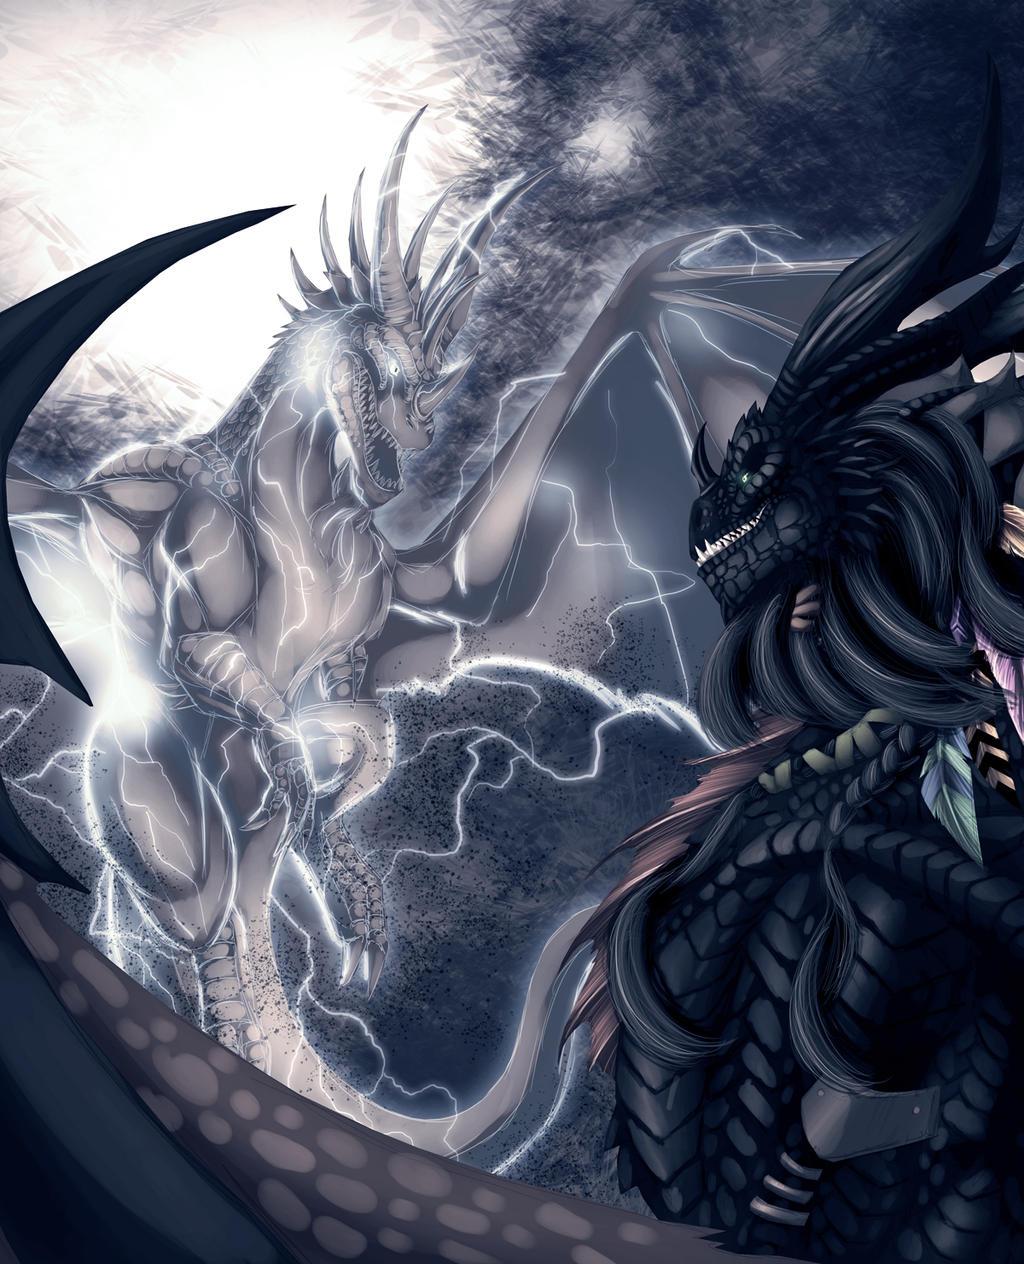 The Infinite Messenger by Ghostwalker2061